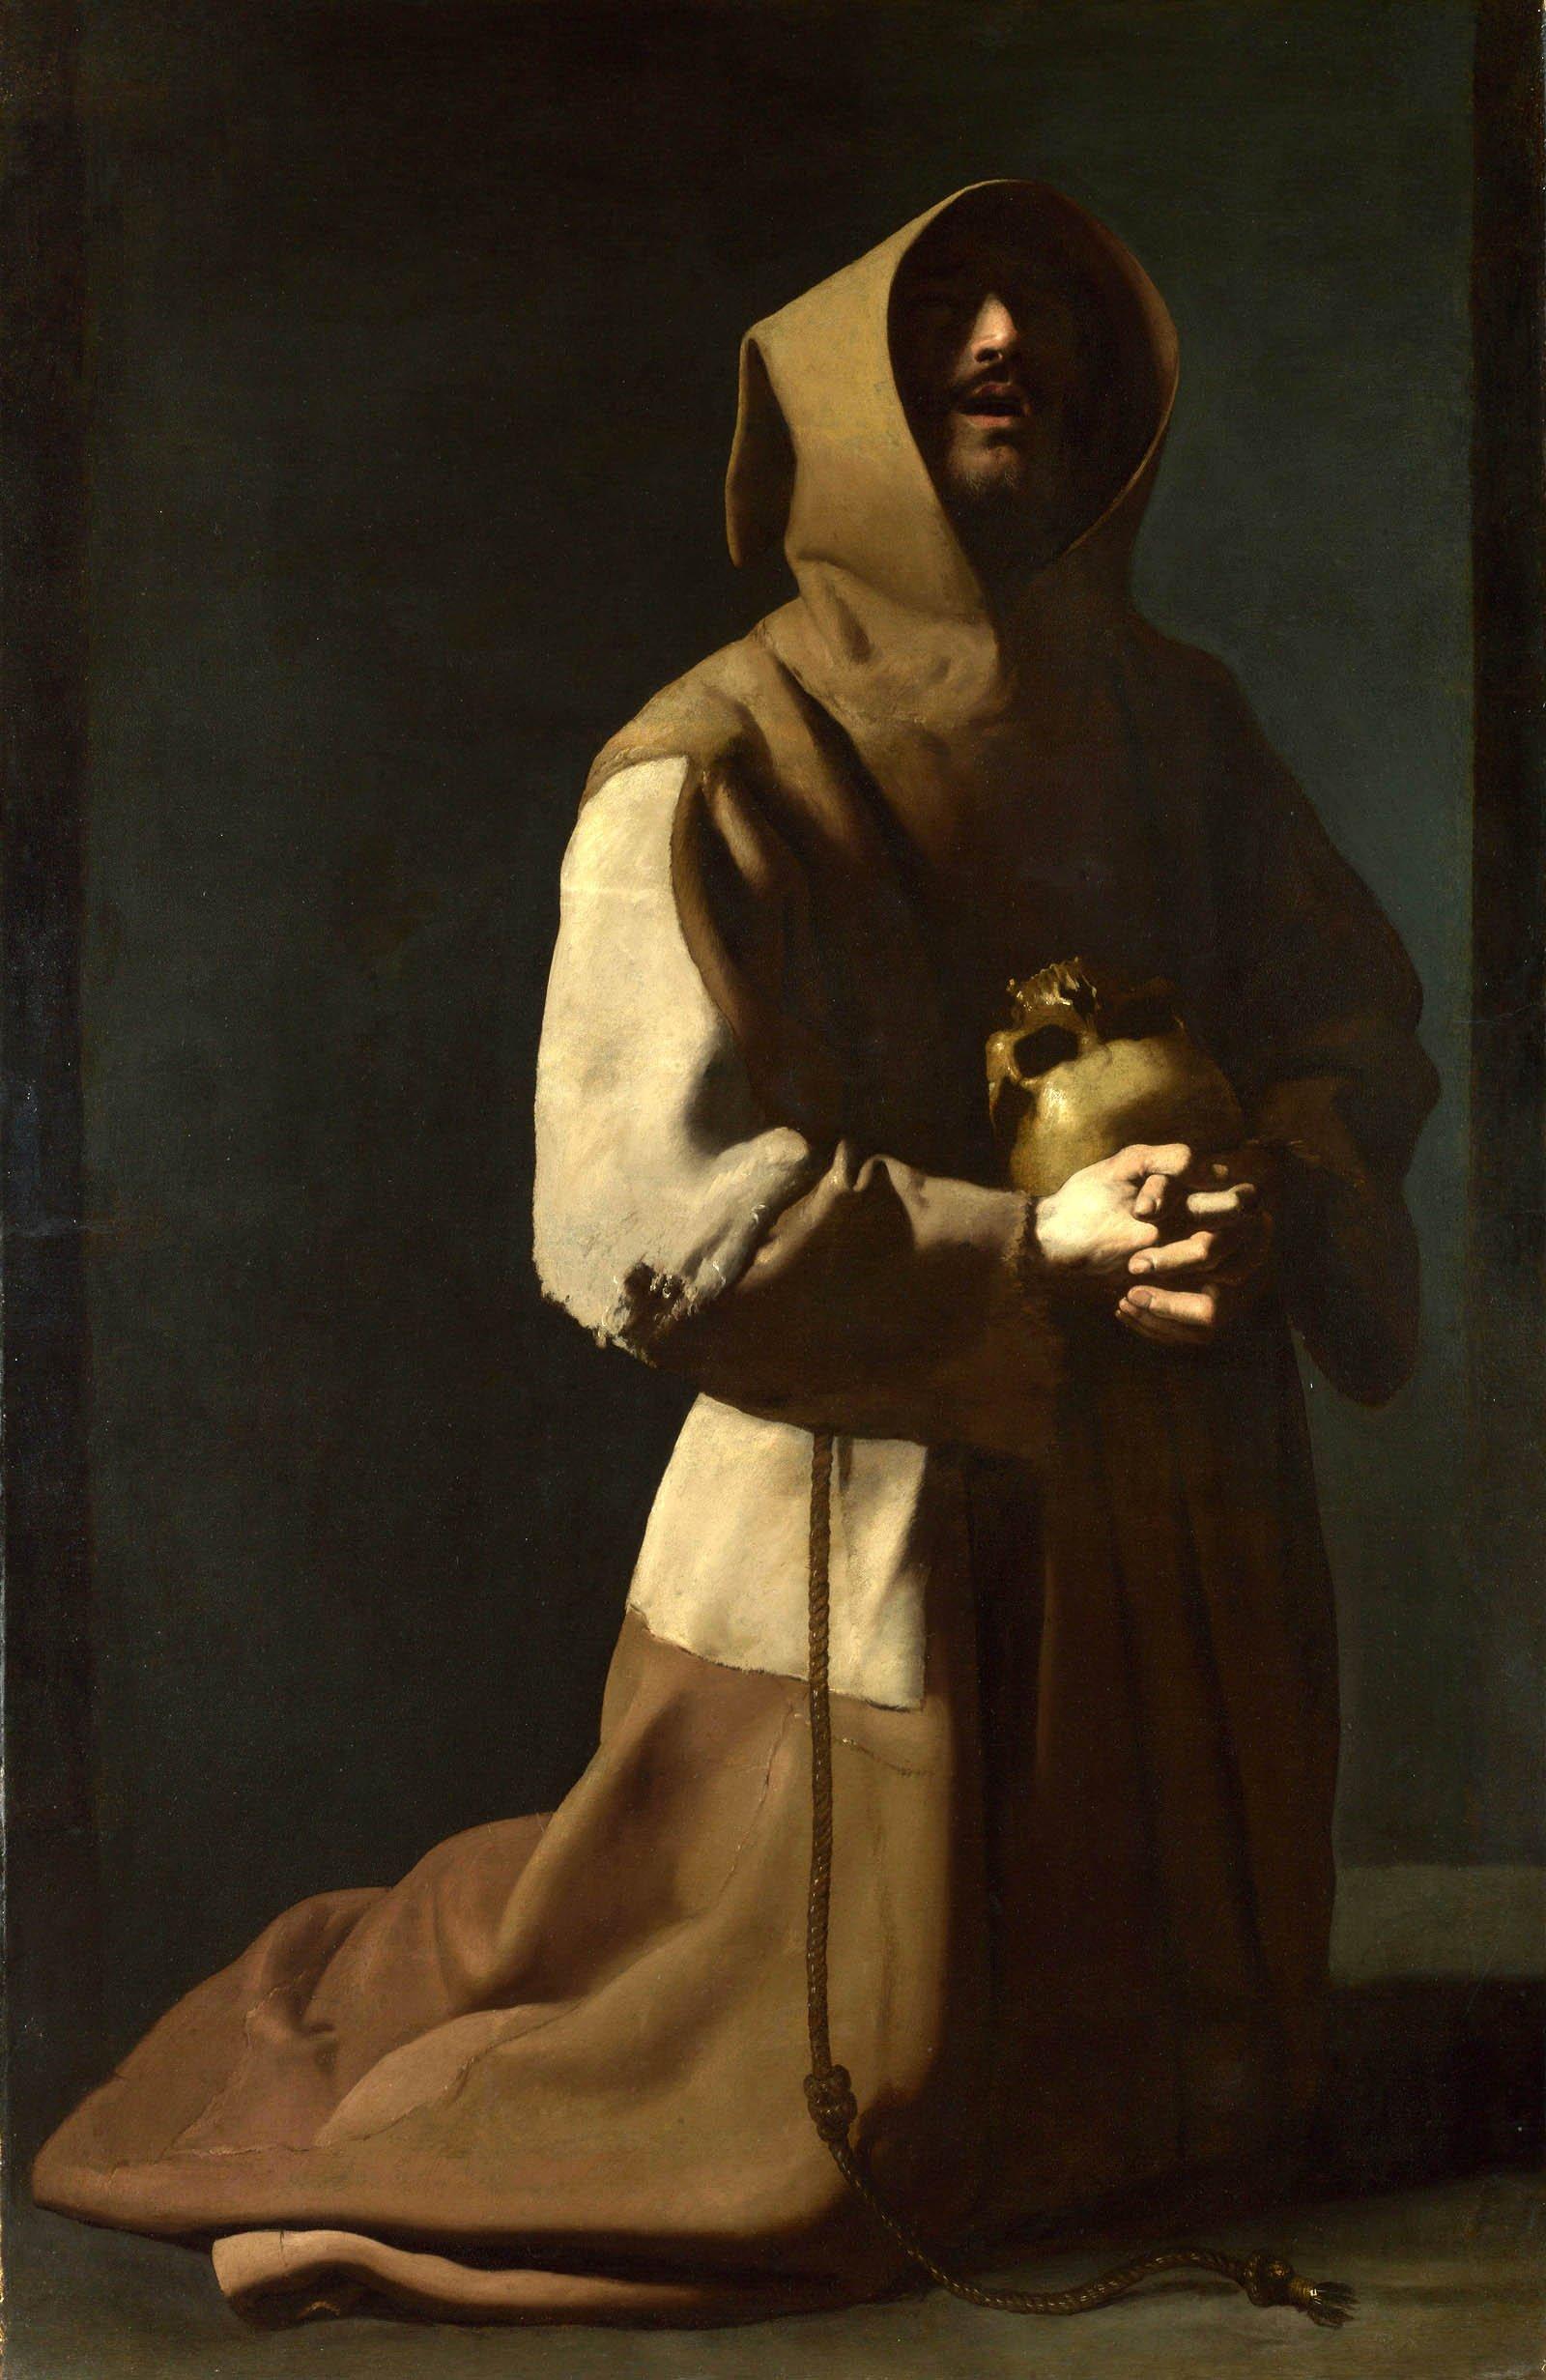 Saint Francis in Meditation, Francisco de Zurbaran